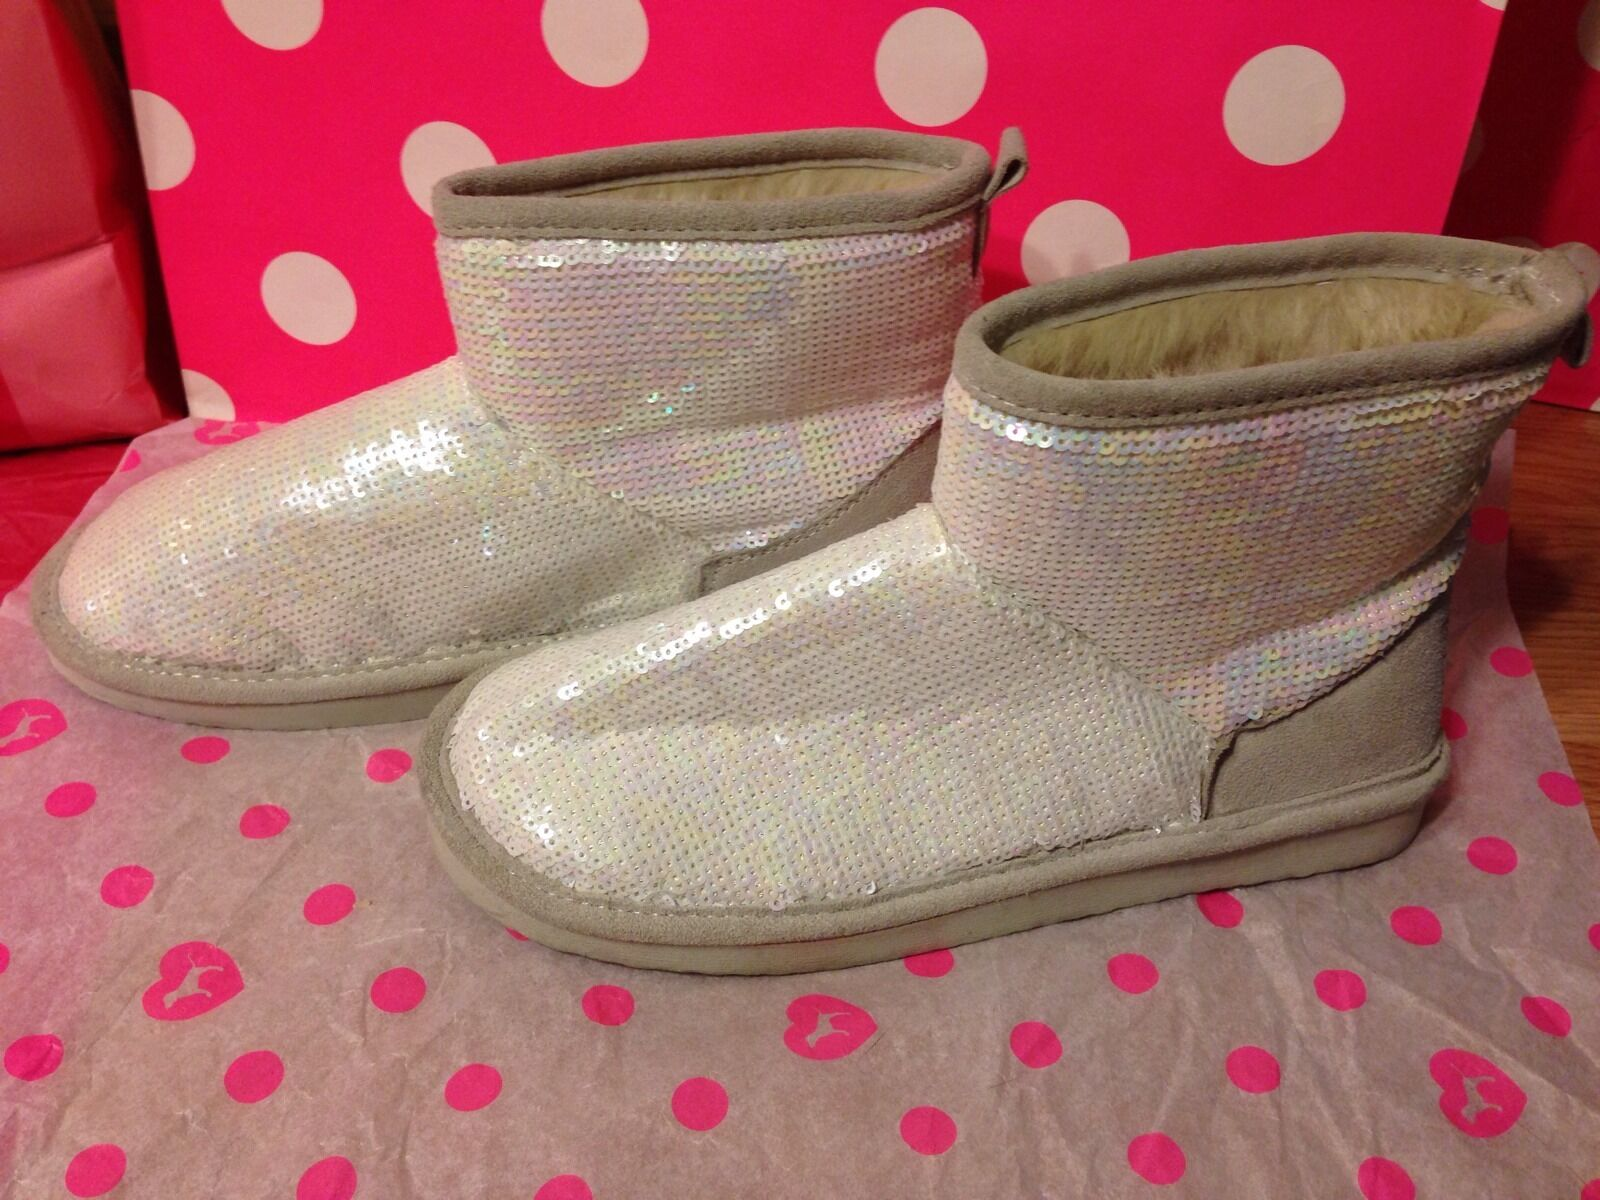 Victoria's Secret PINK Bling Sequin Mukluk Booties Boots Slippers Medium 7-8